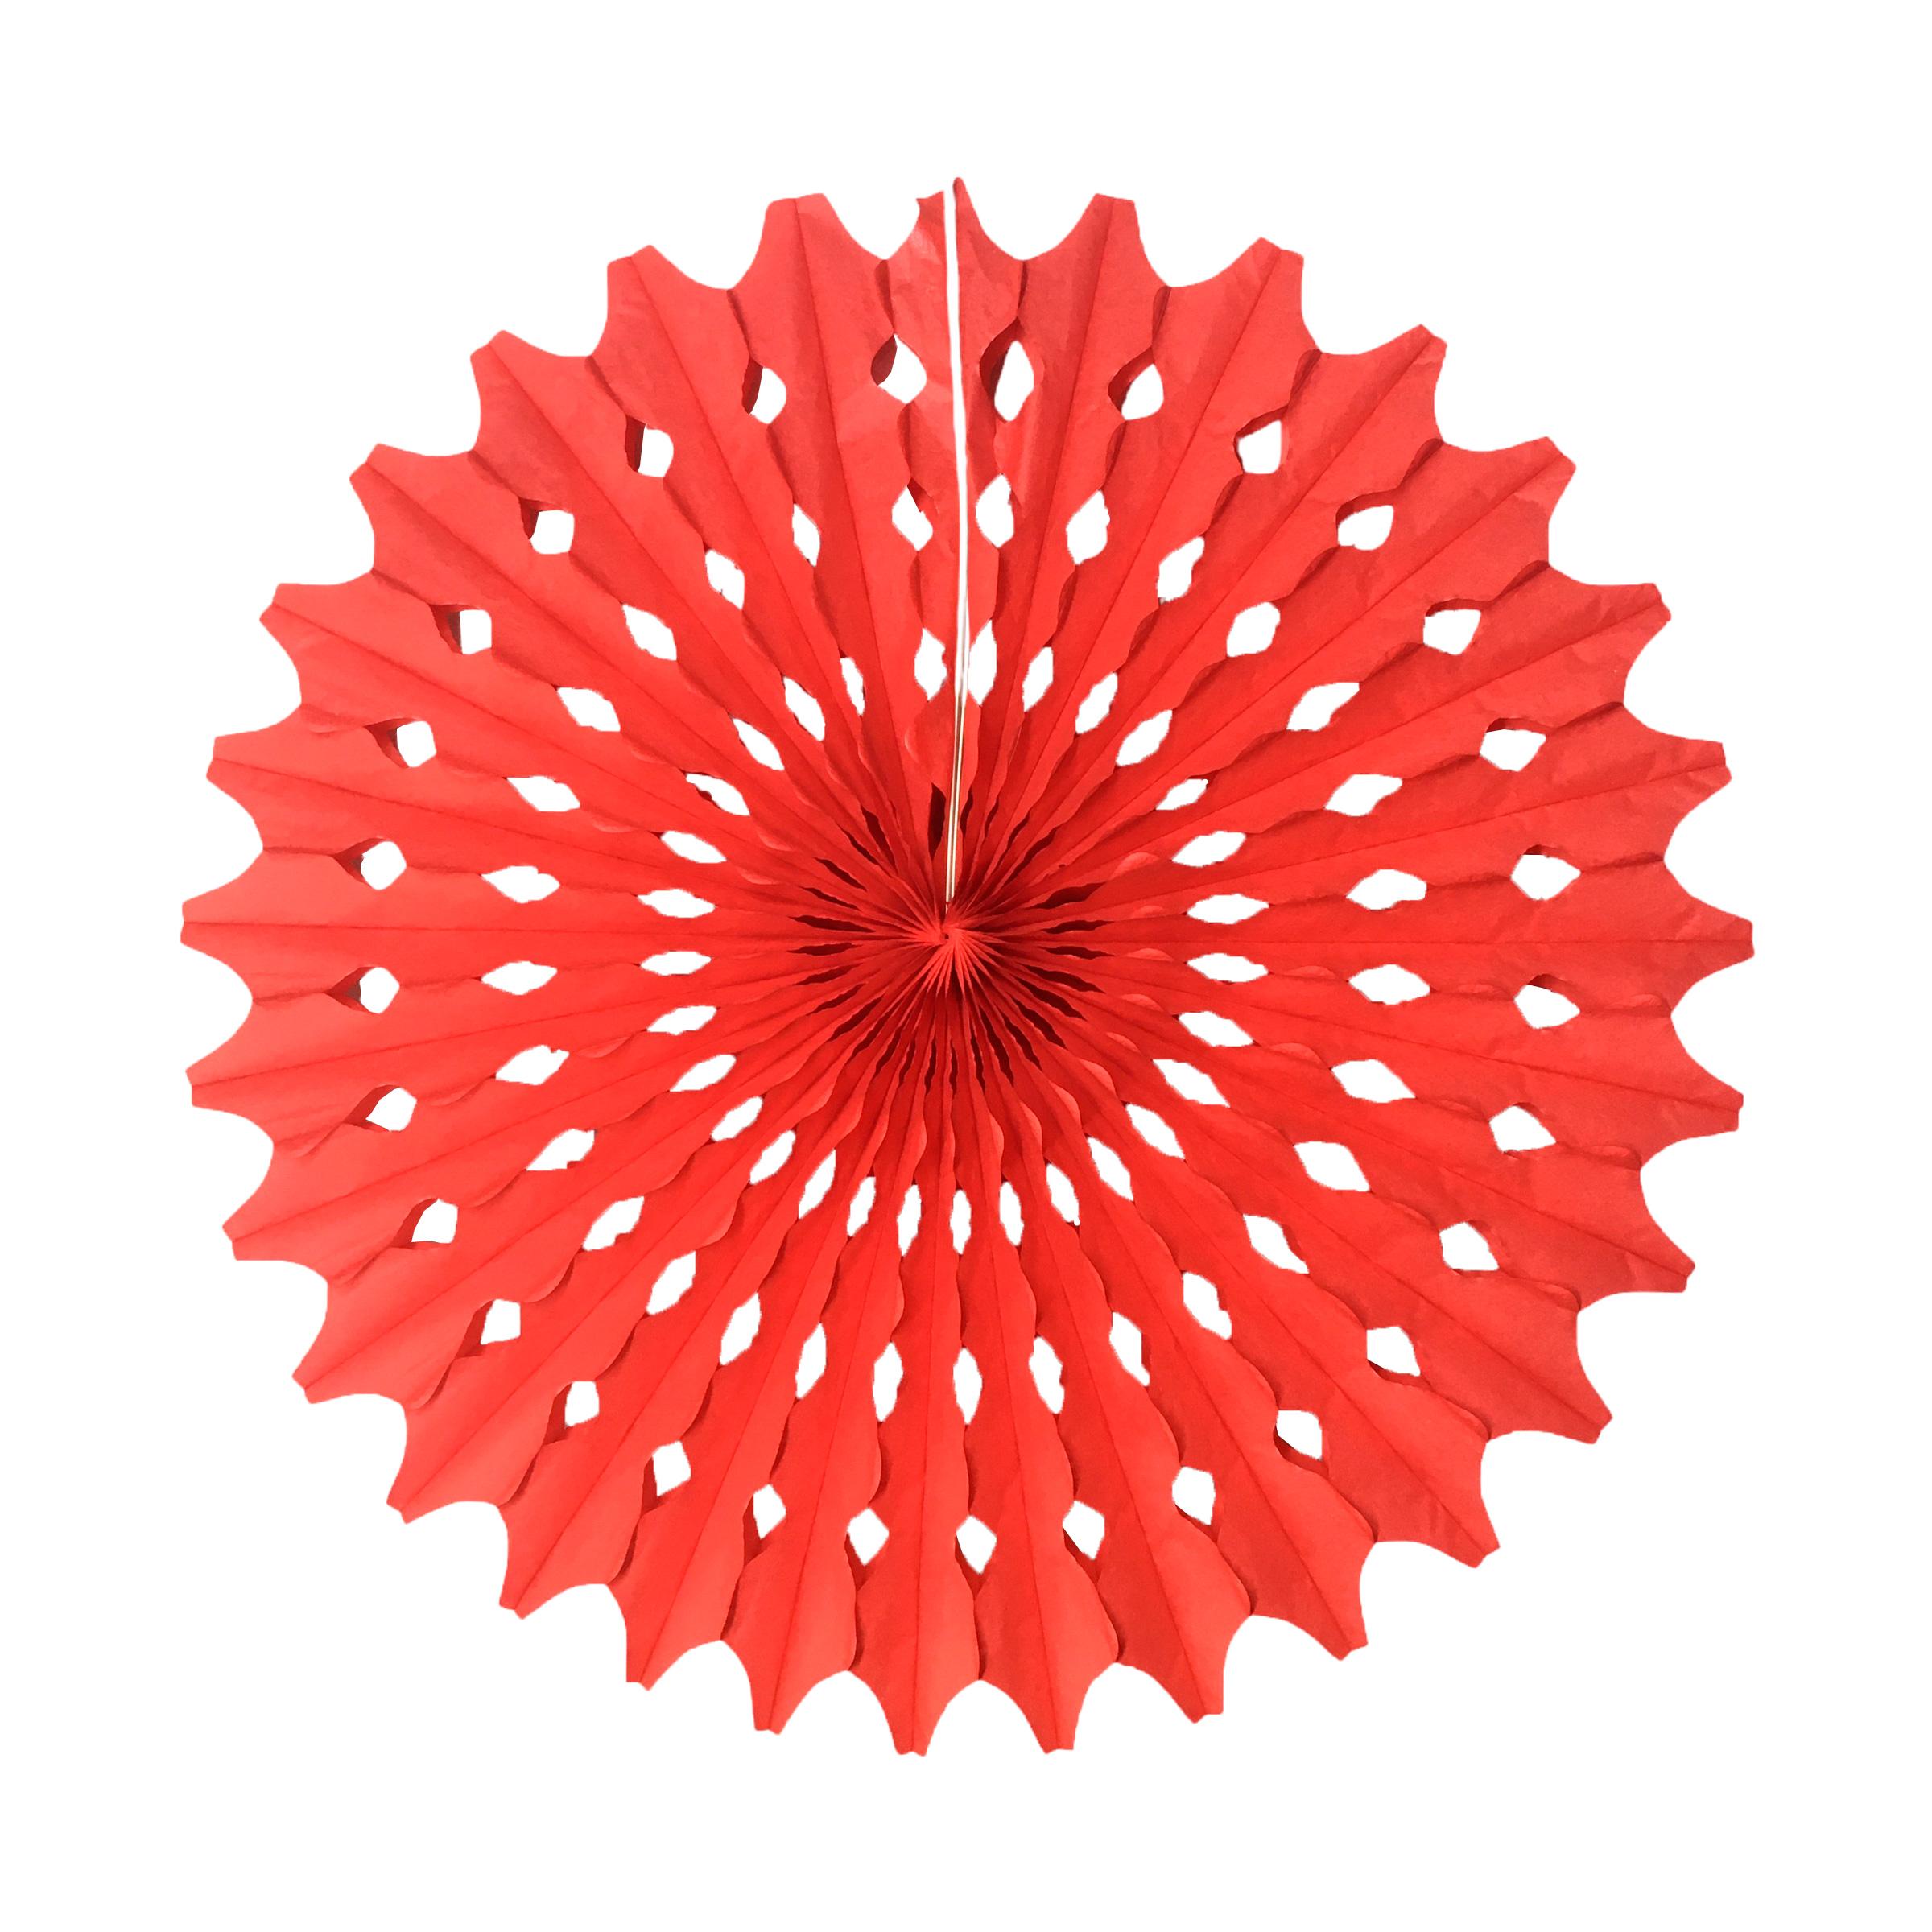 Guirlanda Redonda Vermelha 500 mm